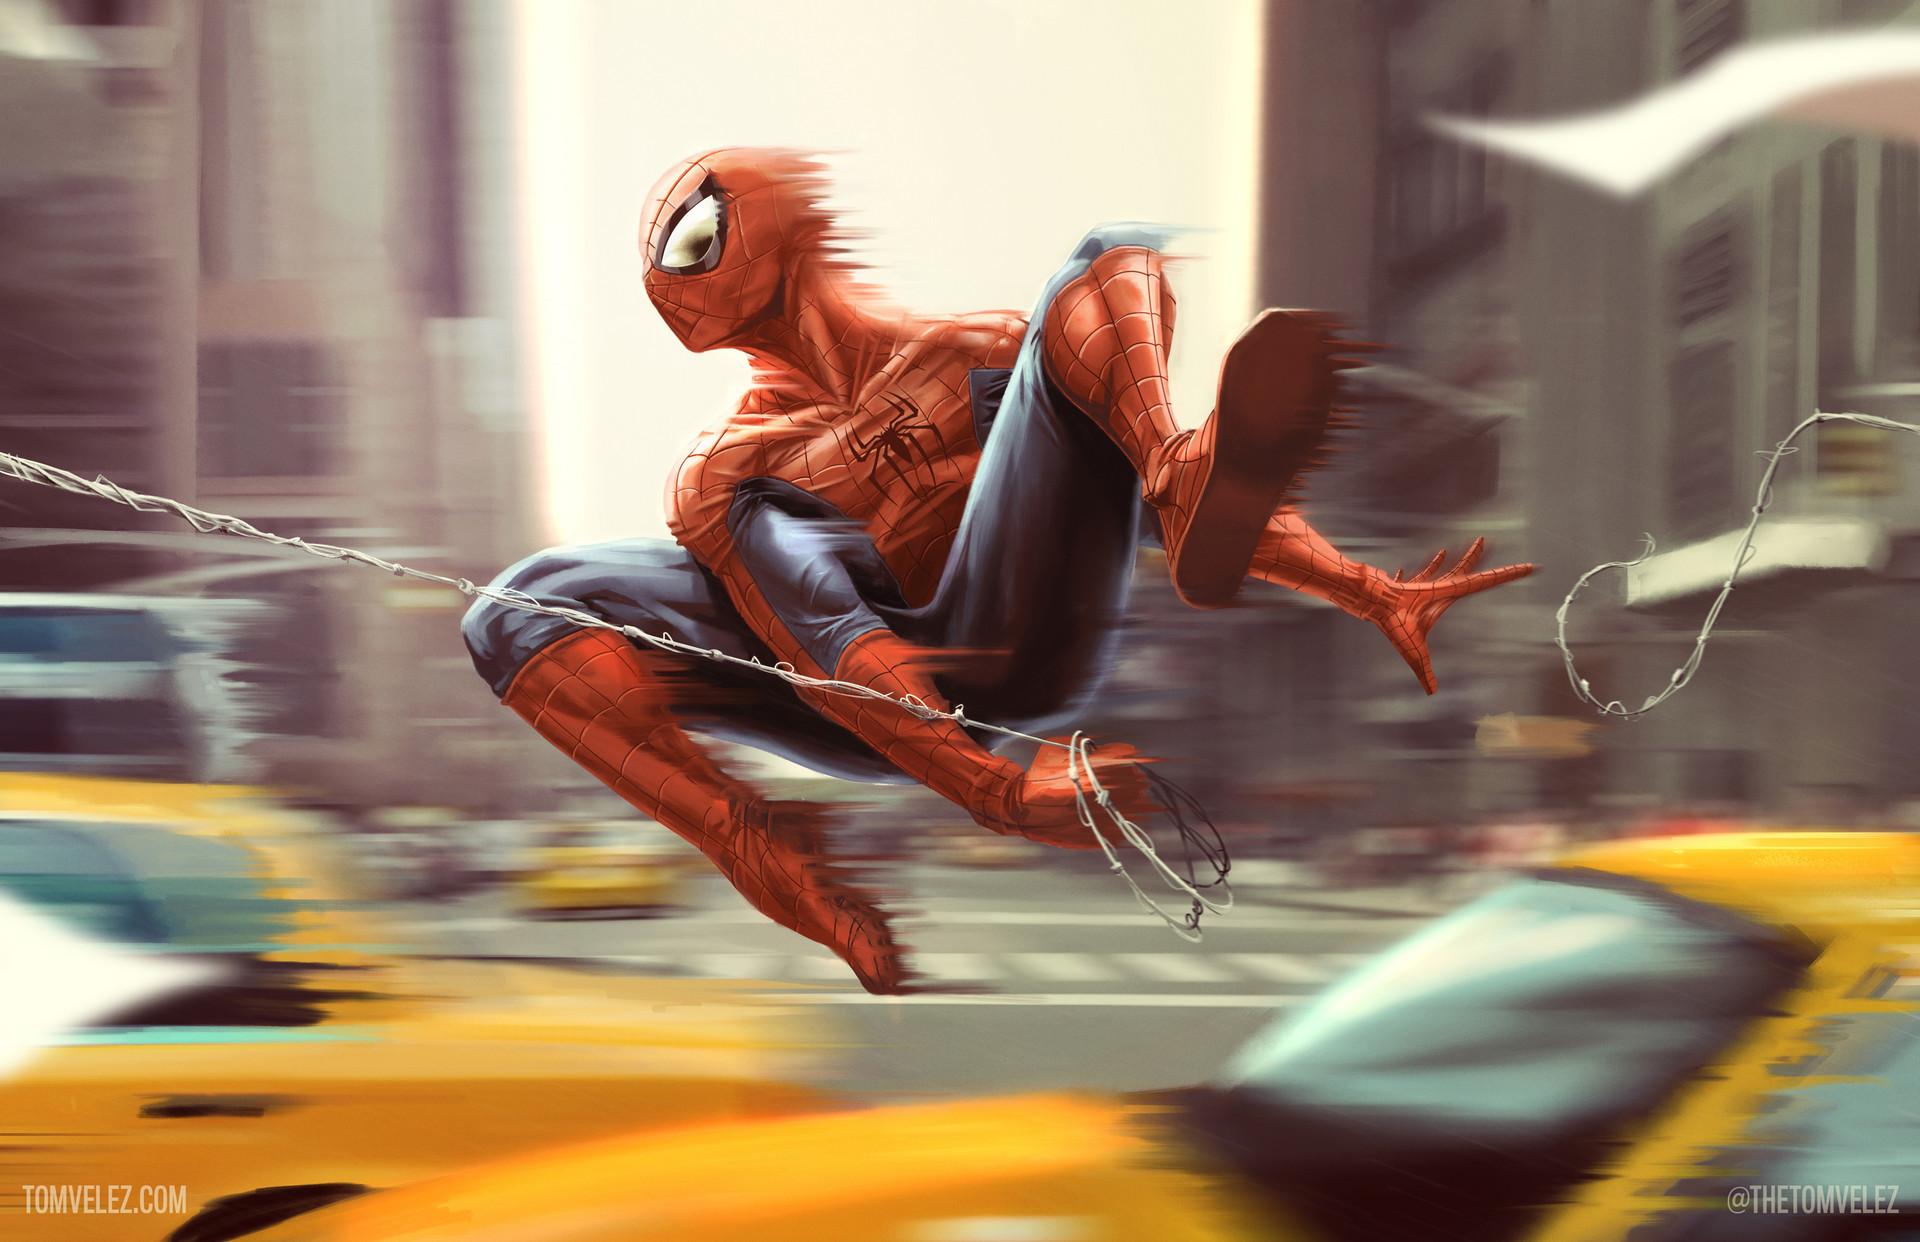 Wallpaper Spider Man 2099 Fan Art 4k Creative Graphics: Spiderman Fan Art, HD Superheroes, 4k Wallpapers, Images